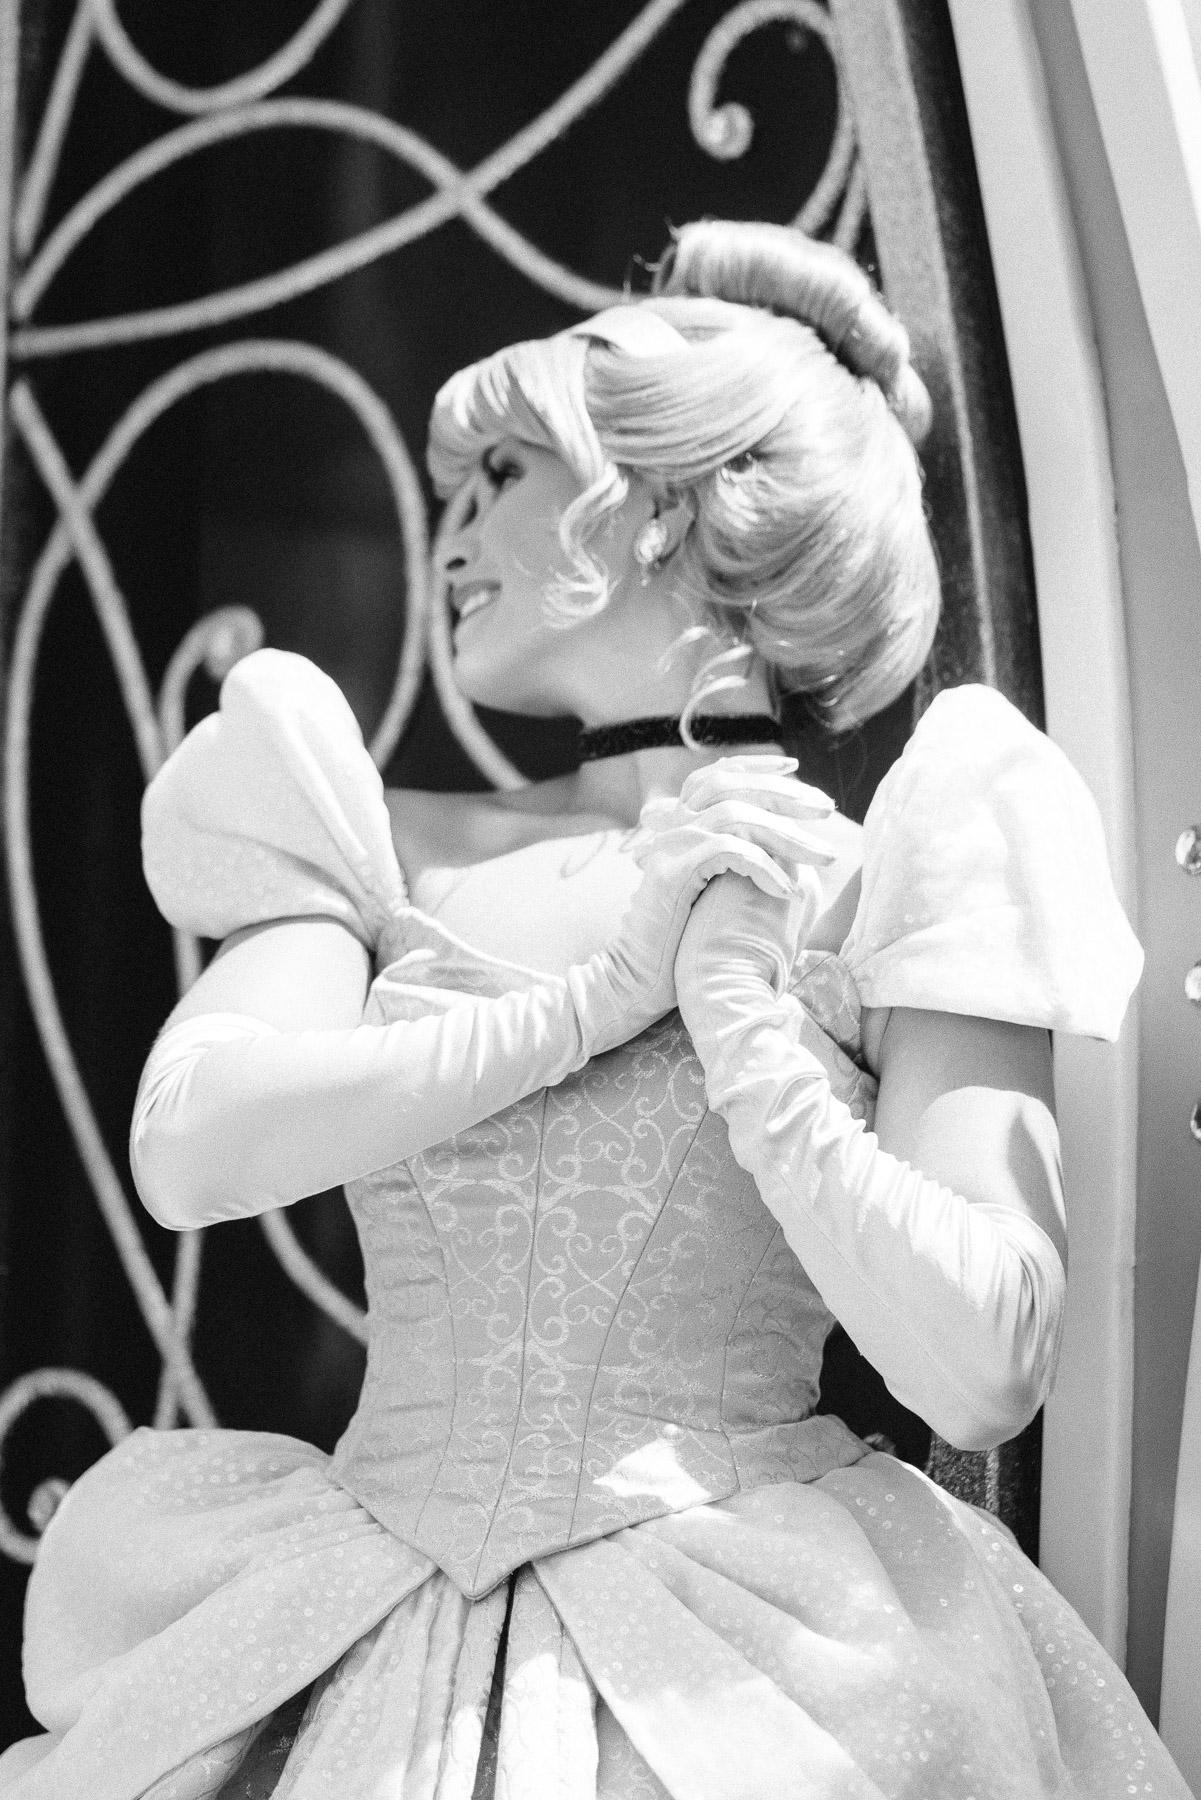 KateTaramykinStudios-Disney-World-Photographer-May-2017-4.jpg